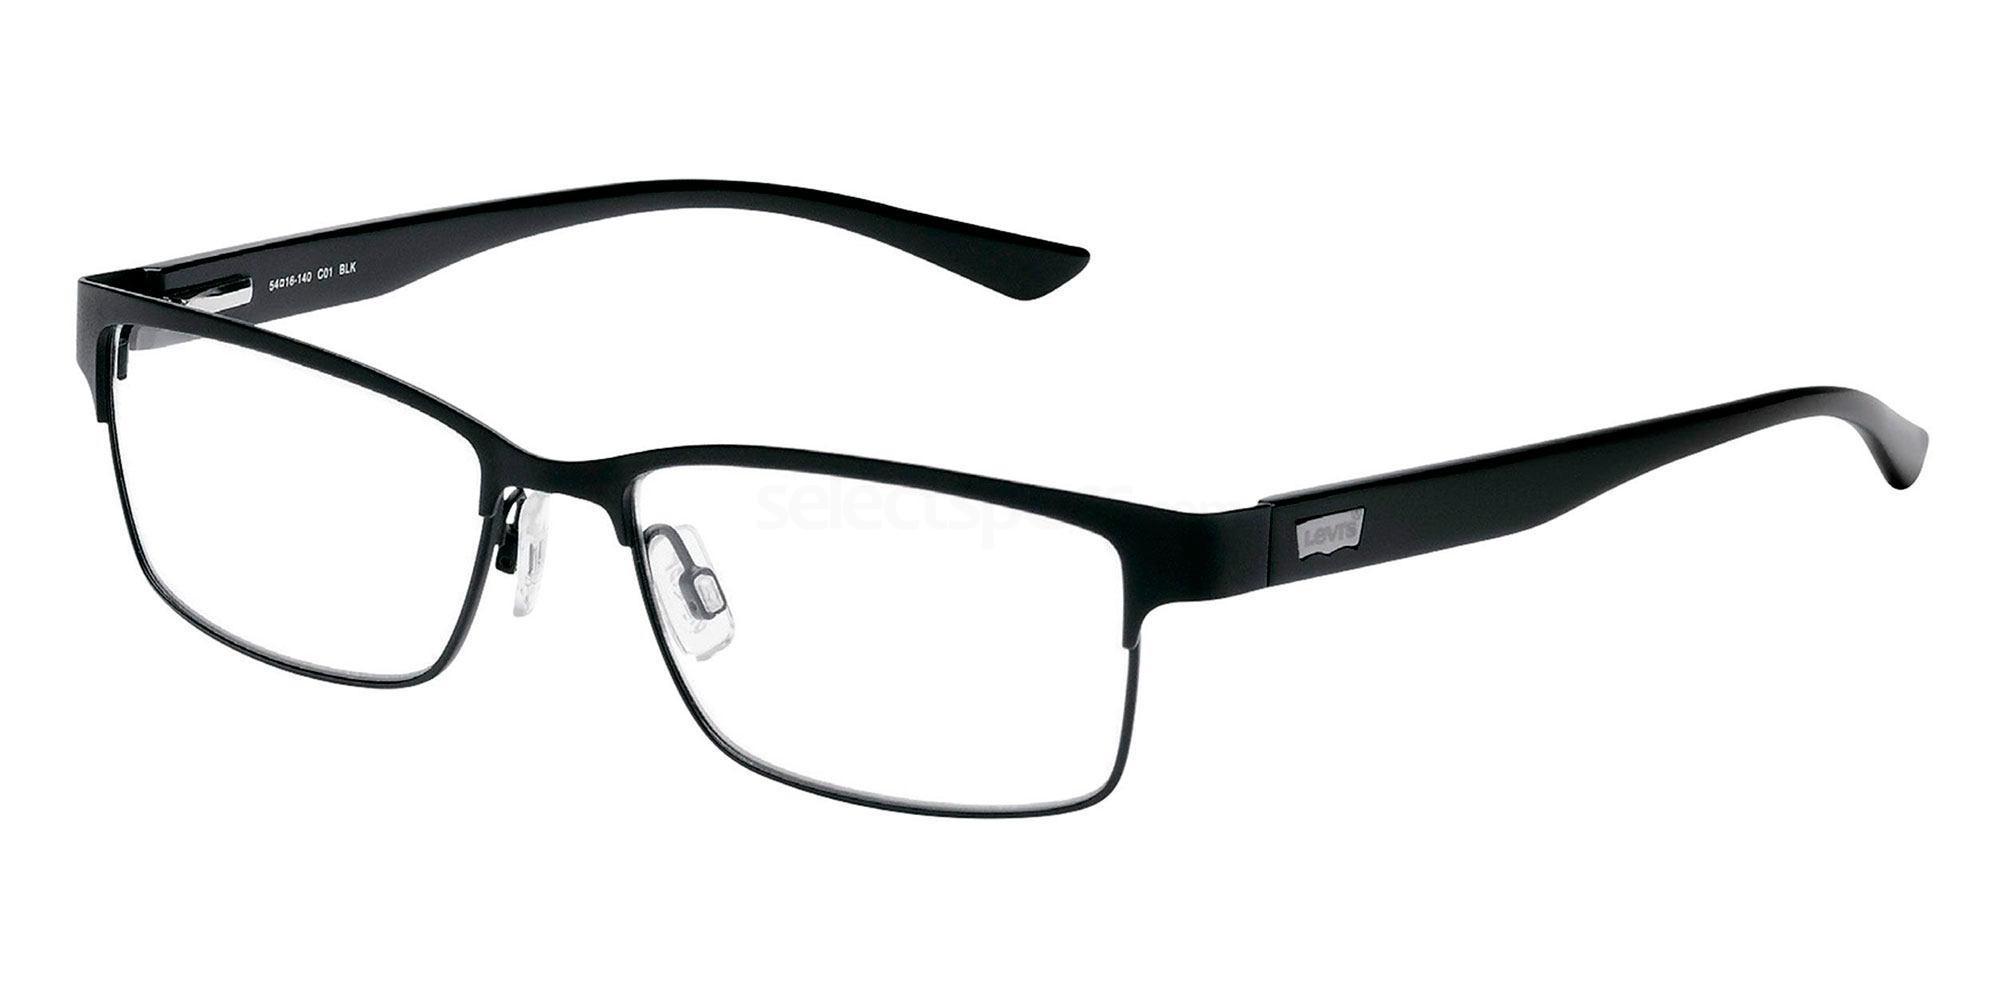 01 BLK LS107 Glasses, Levi's Eyewear